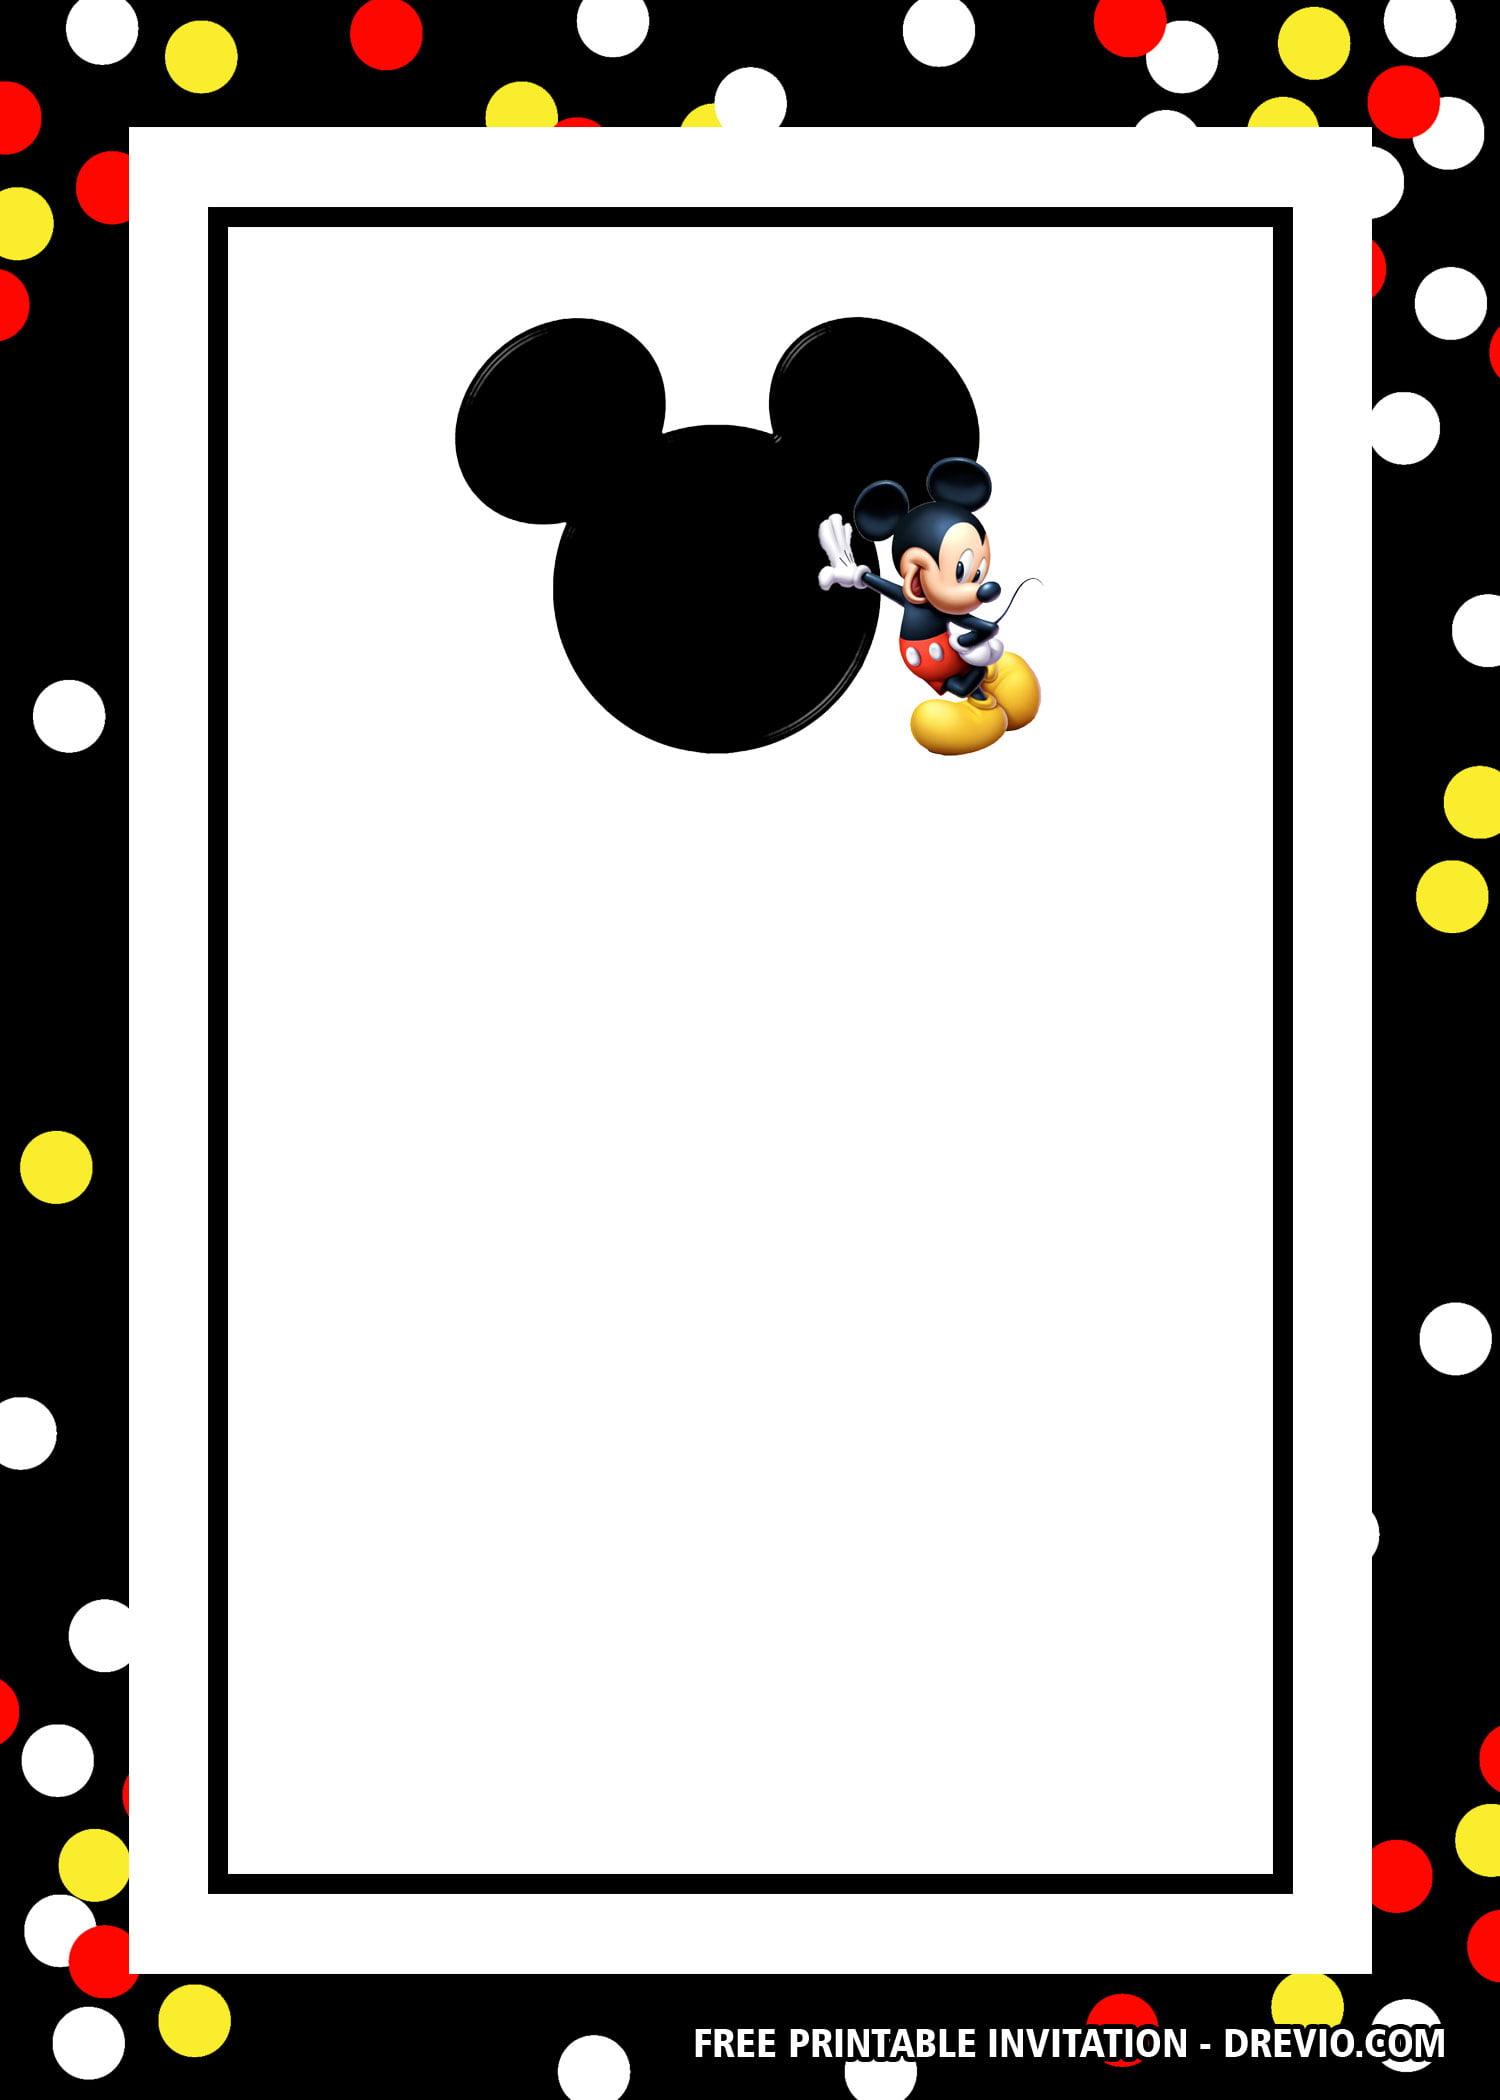 Free Mickey Mouse Head Invitation Templates